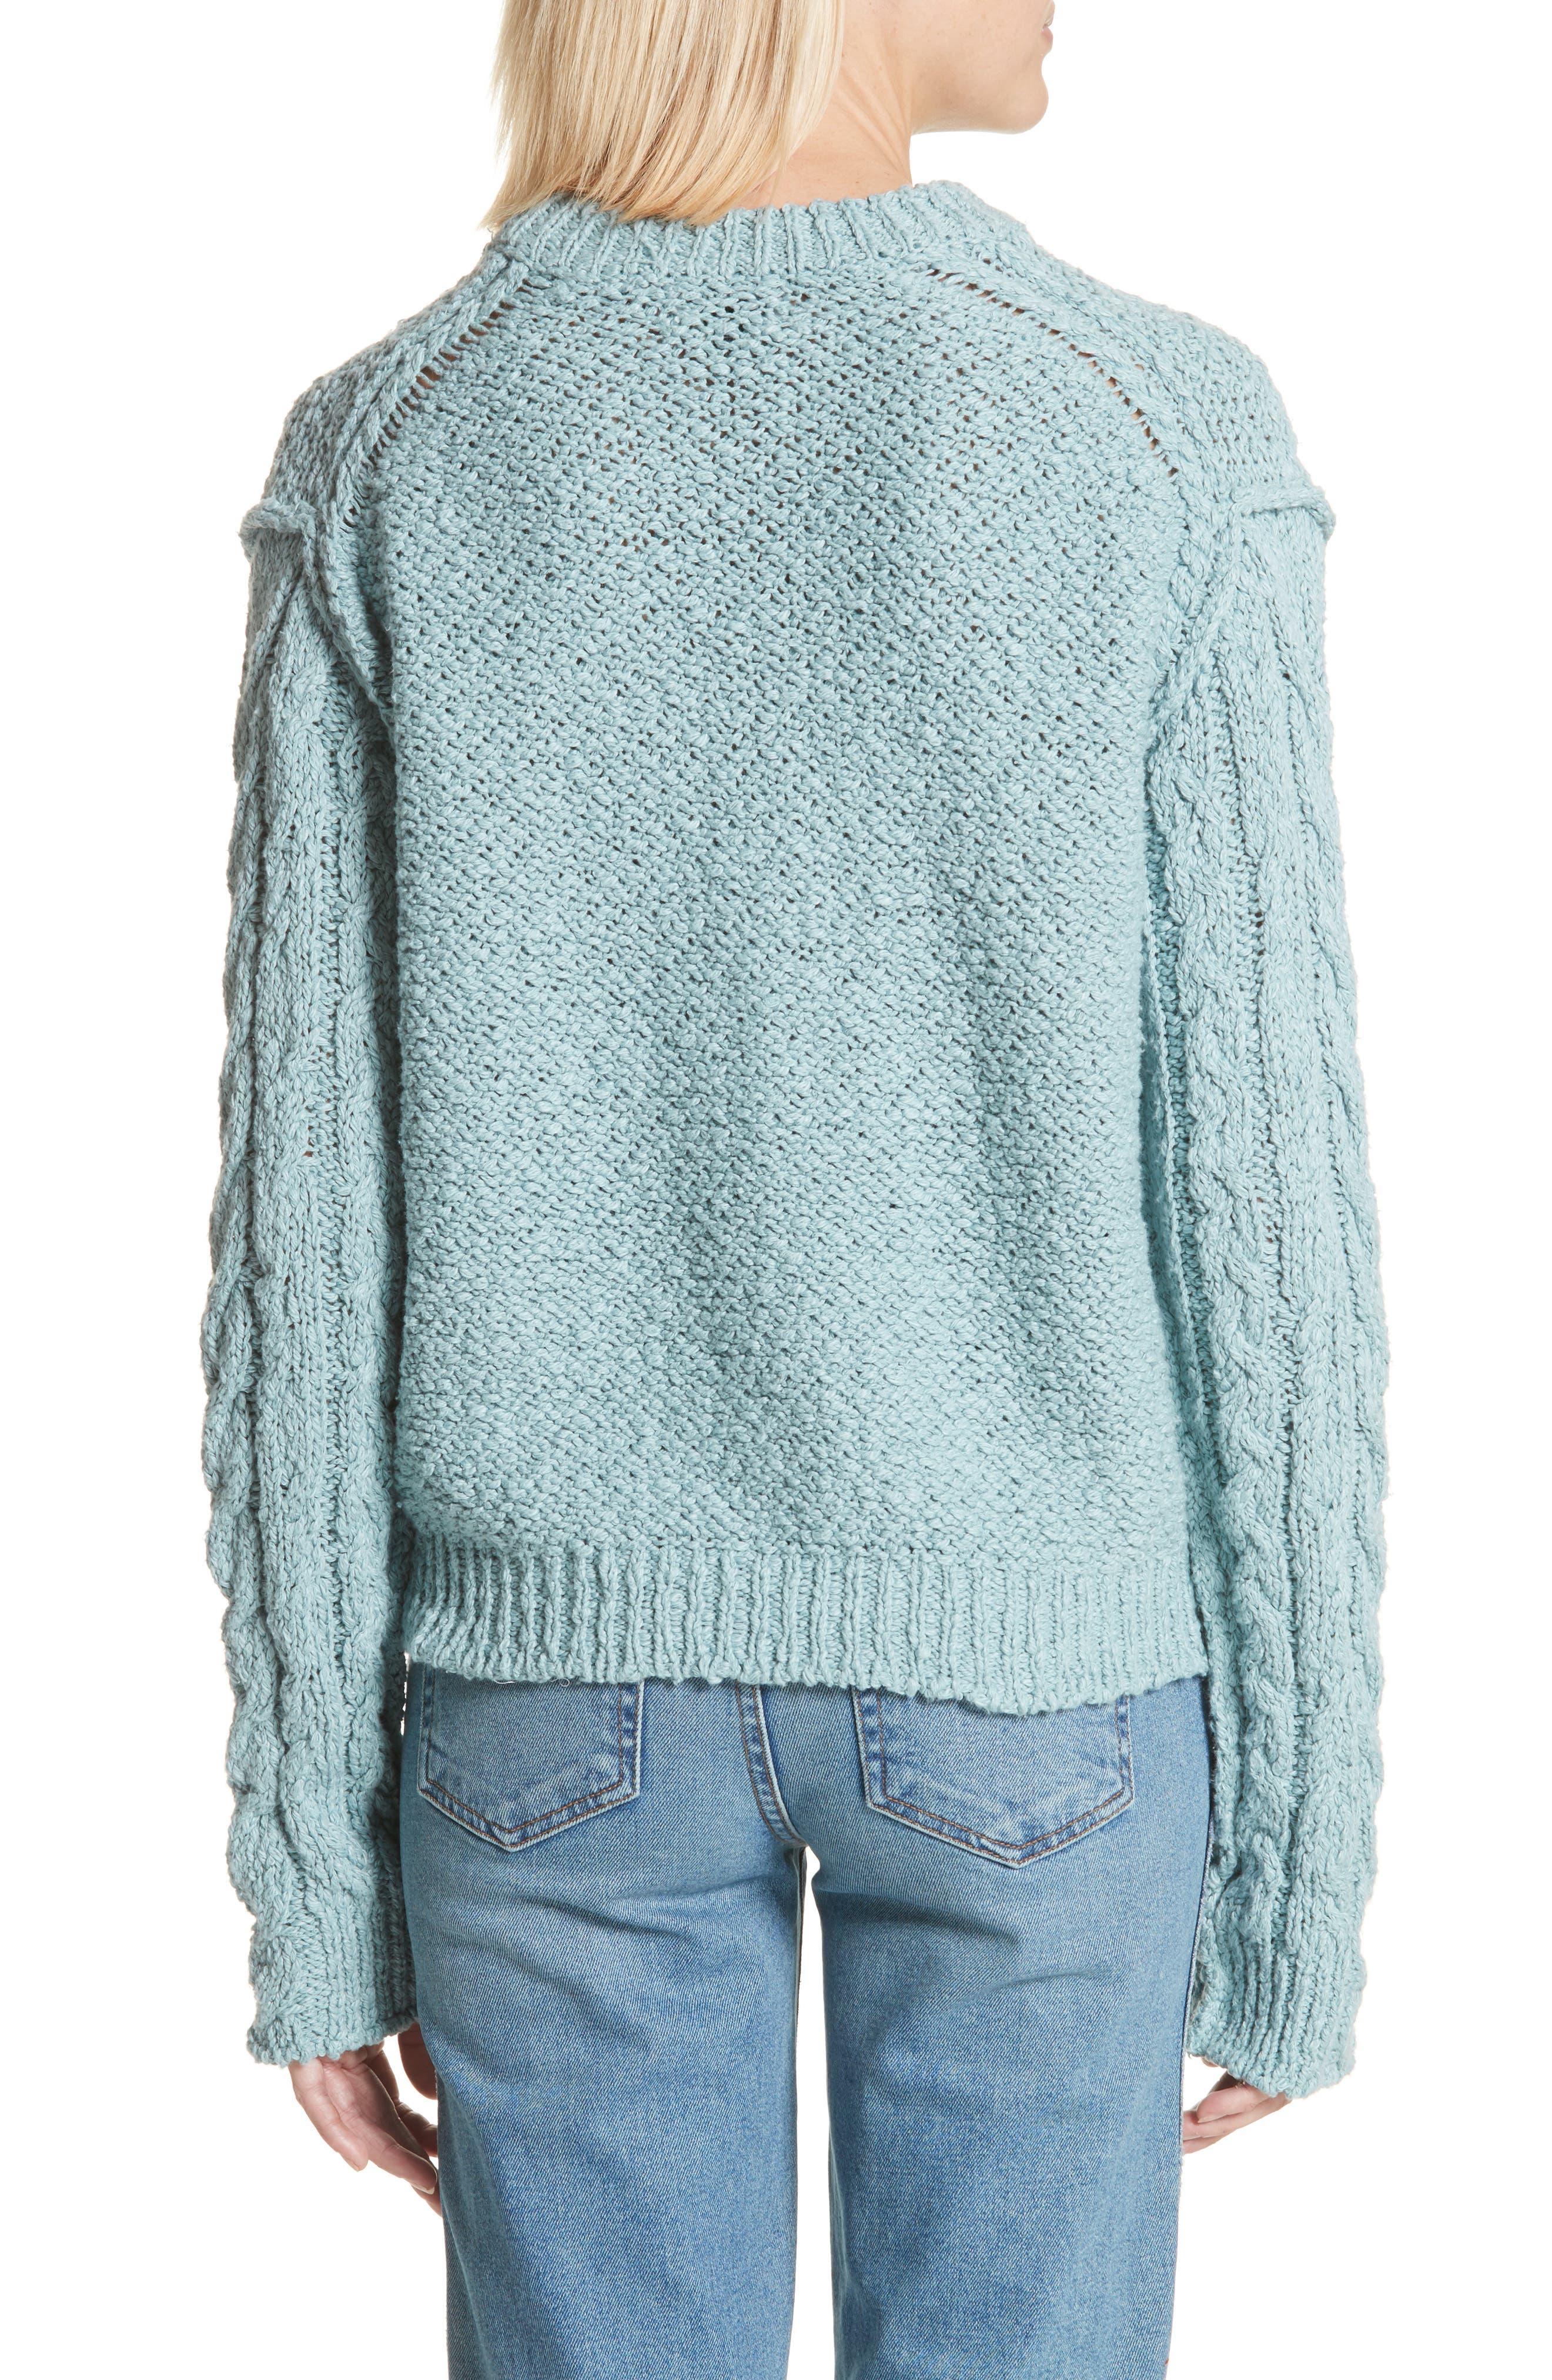 Hila Cable Sleeve Sweater,                             Alternate thumbnail 2, color,                             Blue